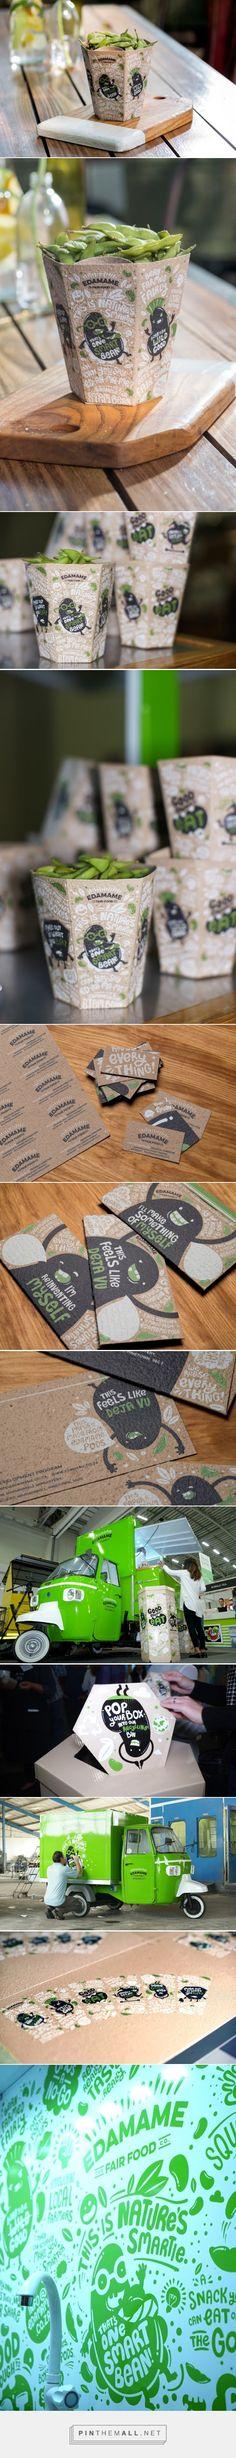 One Smart Bean Edamame packaging designed by The Hardy Boys & THB Disturbance - http://www.packagingoftheworld.com/2015/08/edamame-one-smart-bean.html